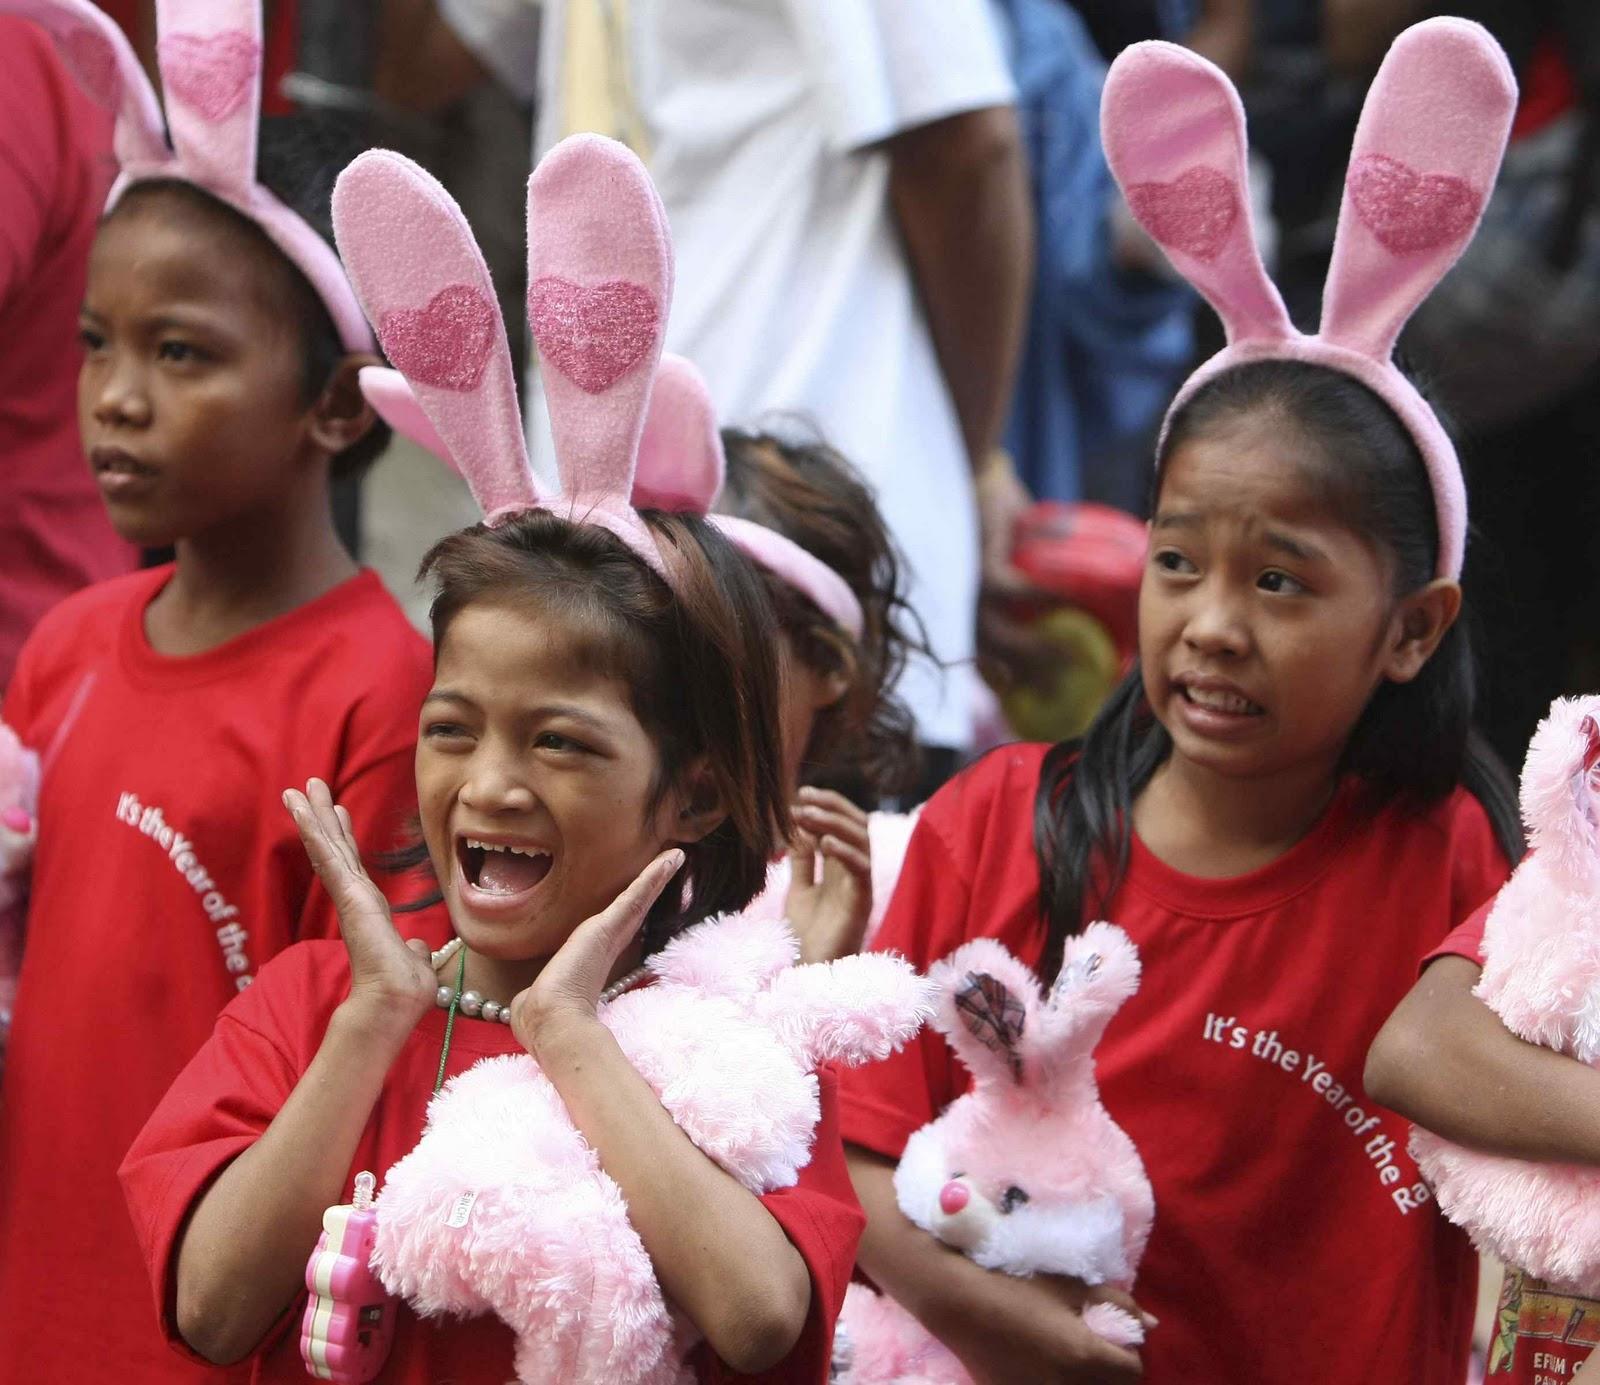 http://3.bp.blogspot.com/_WjviWf8OeLI/TUrffjwCcXI/AAAAAAAAAHo/YN5KEIcsryA/s1600/Philippines+Rabbit+ears.jpg